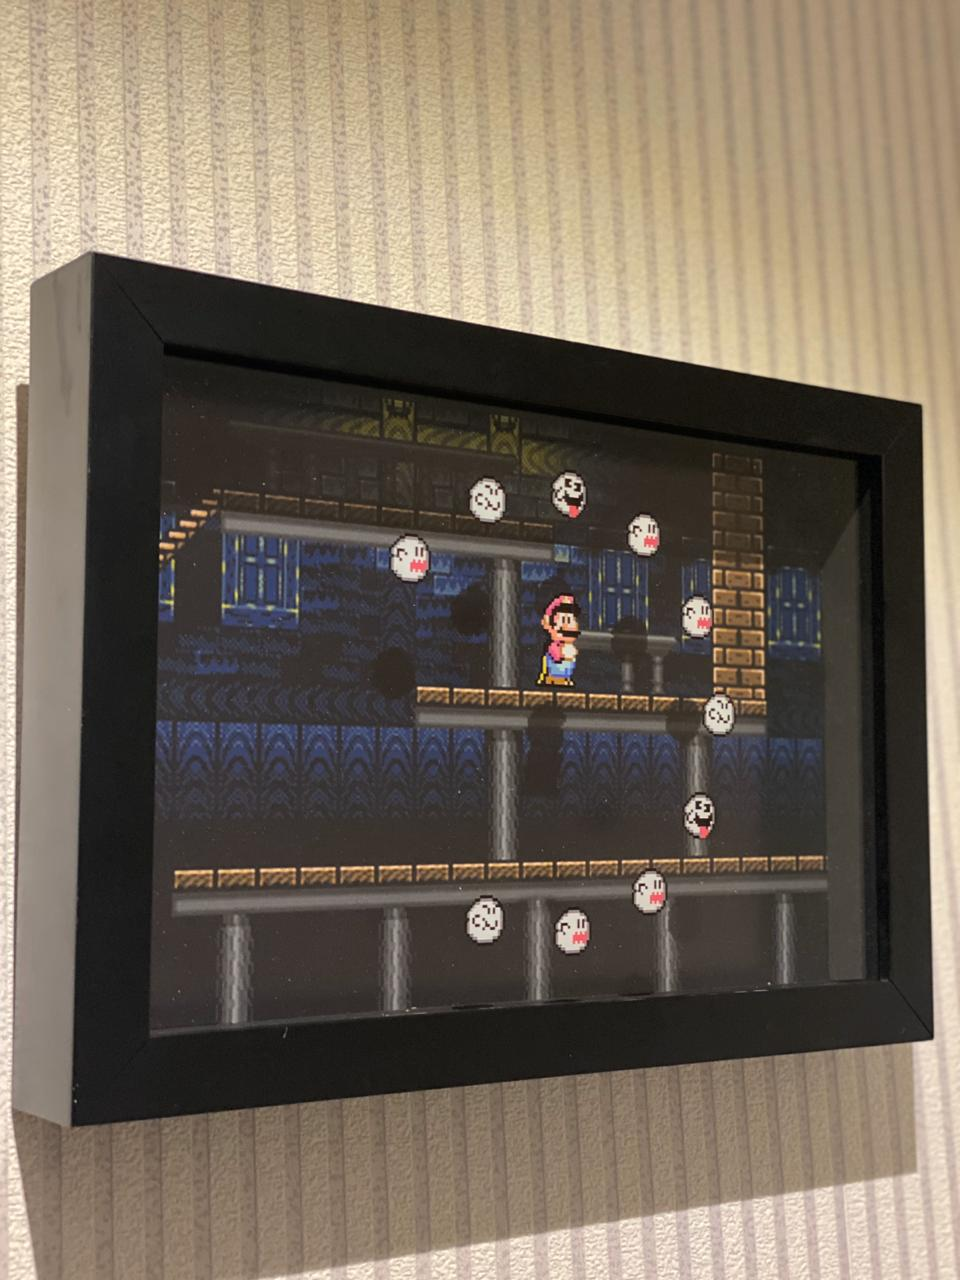 Quadro 3D Fantasmas: Super Mario World